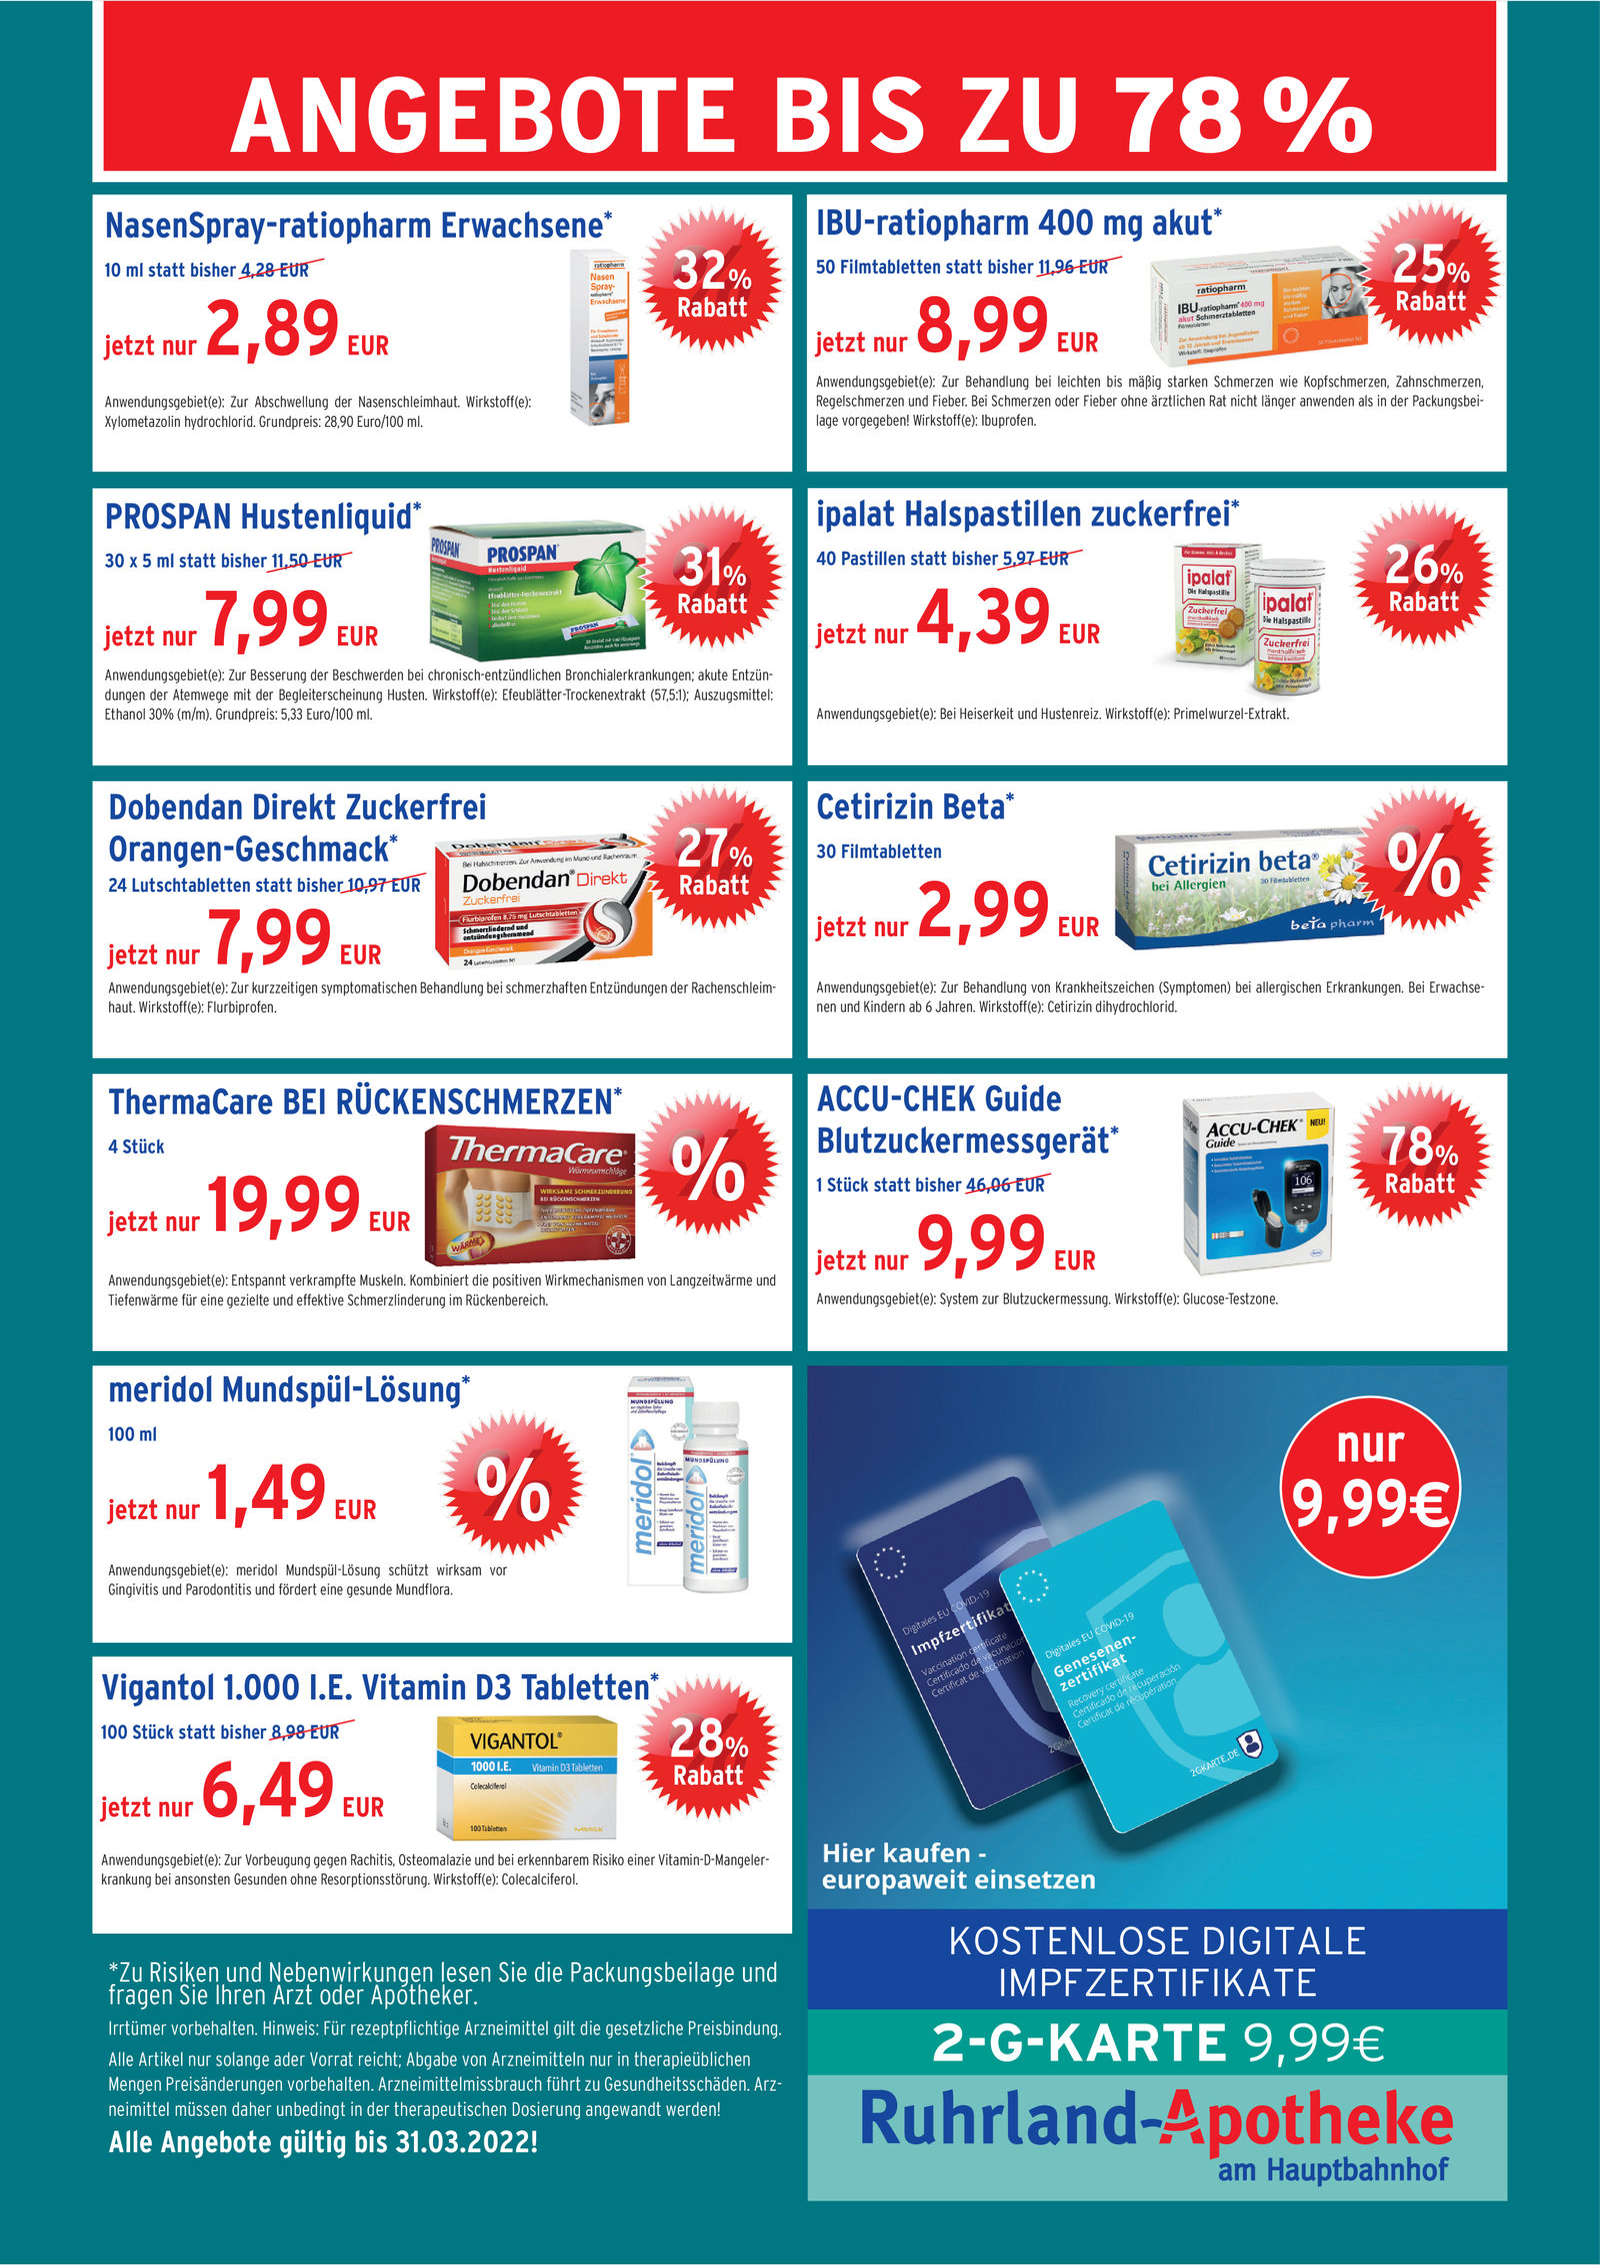 https://mein-uploads.apocdn.net/4668/leaflets/4668_flyer-Seite1.png